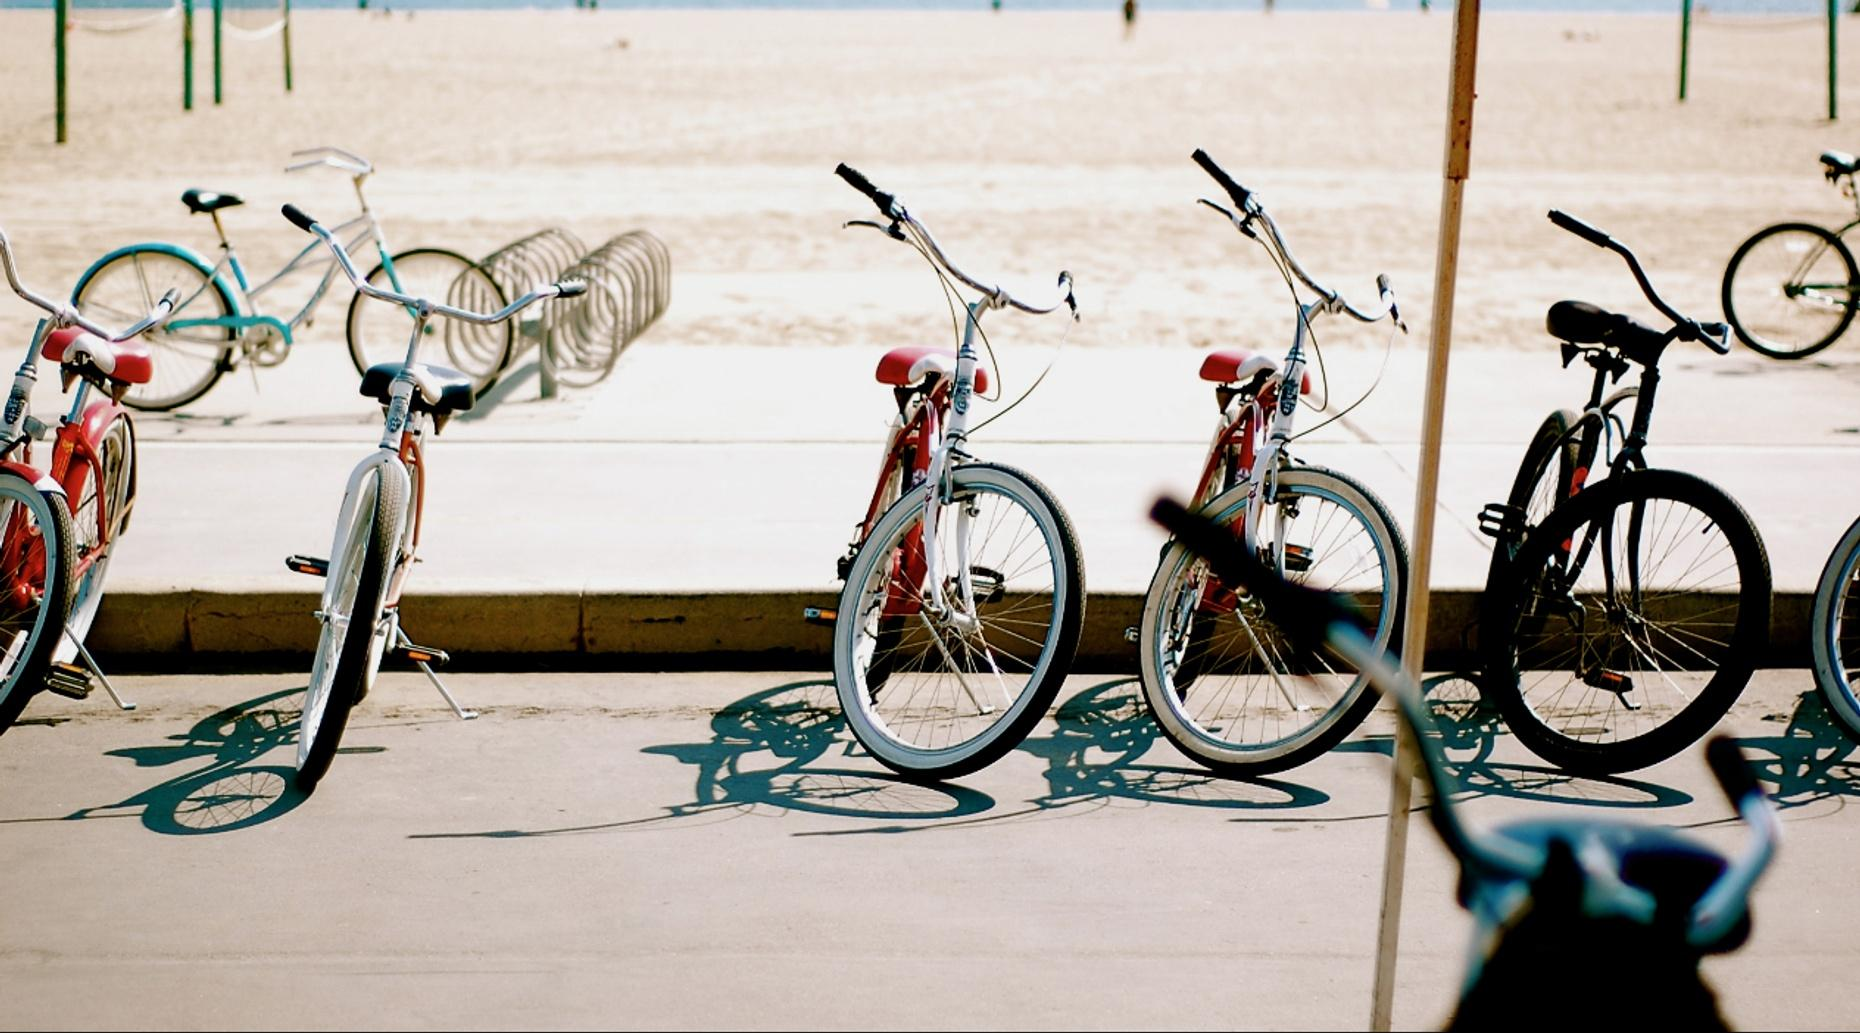 One-Hour Bike Rental in Hollywood